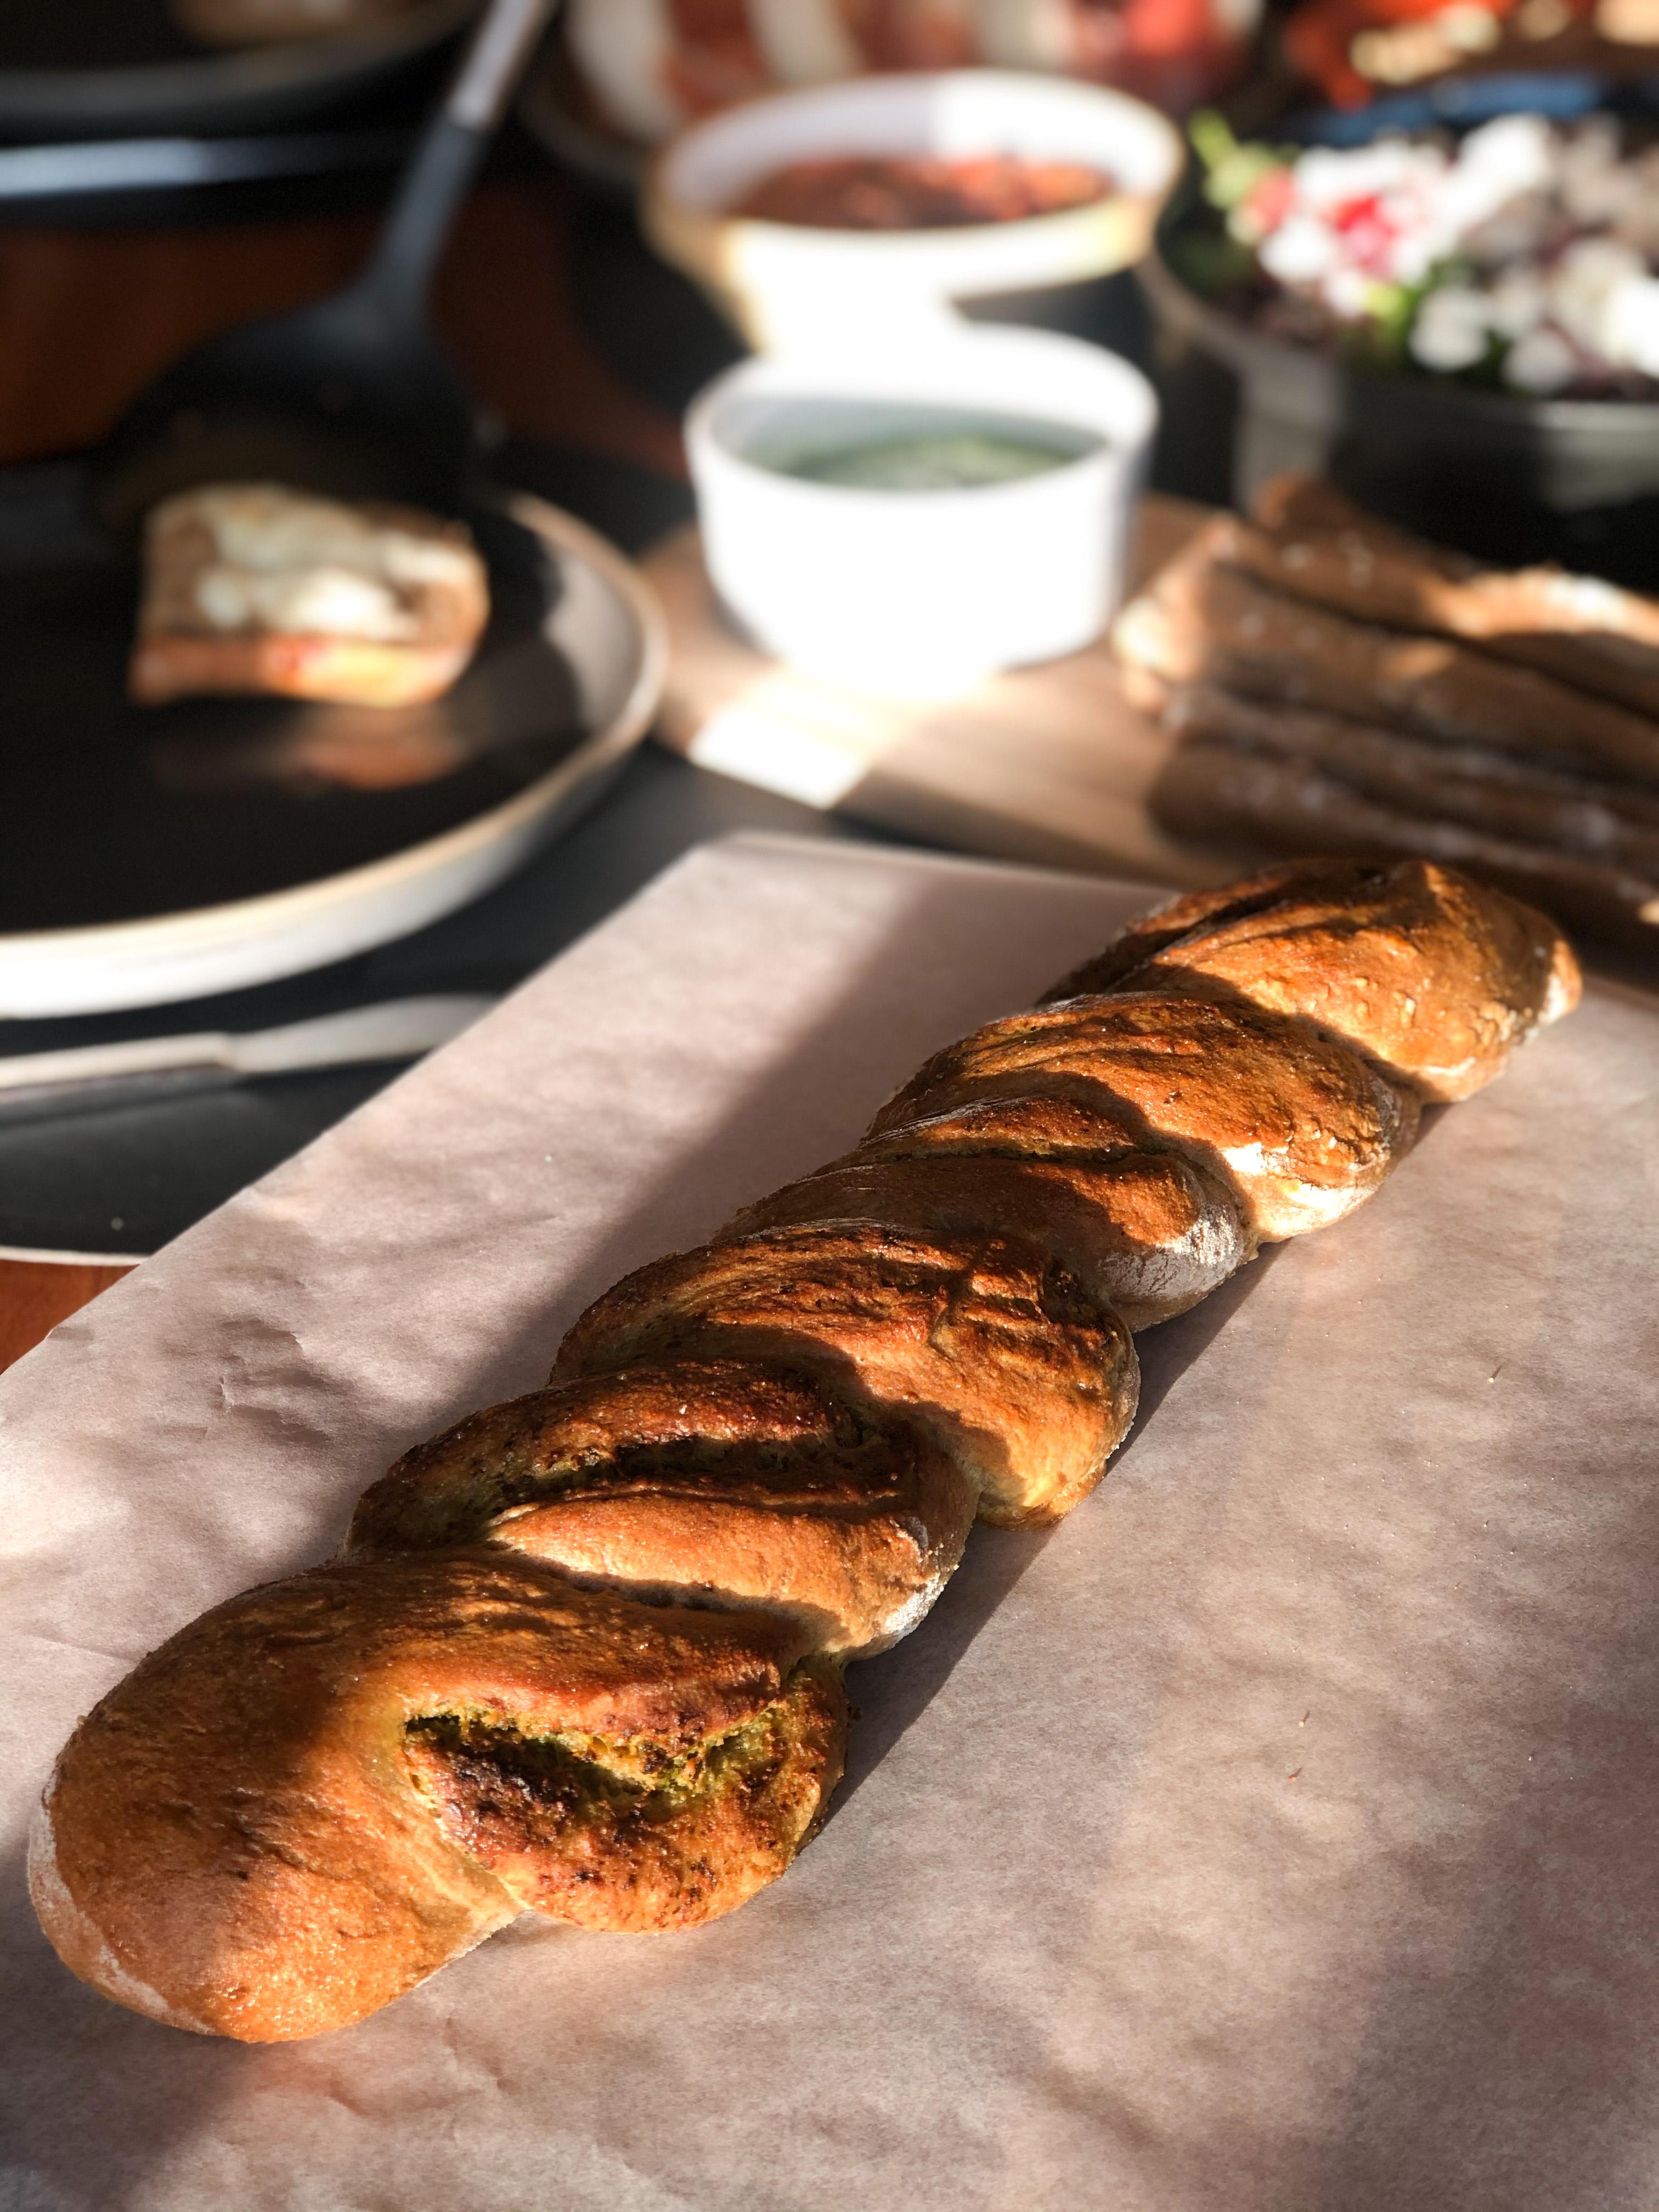 Twisted pesto bread with Agrain® 05 Smoked Super Grain Flour